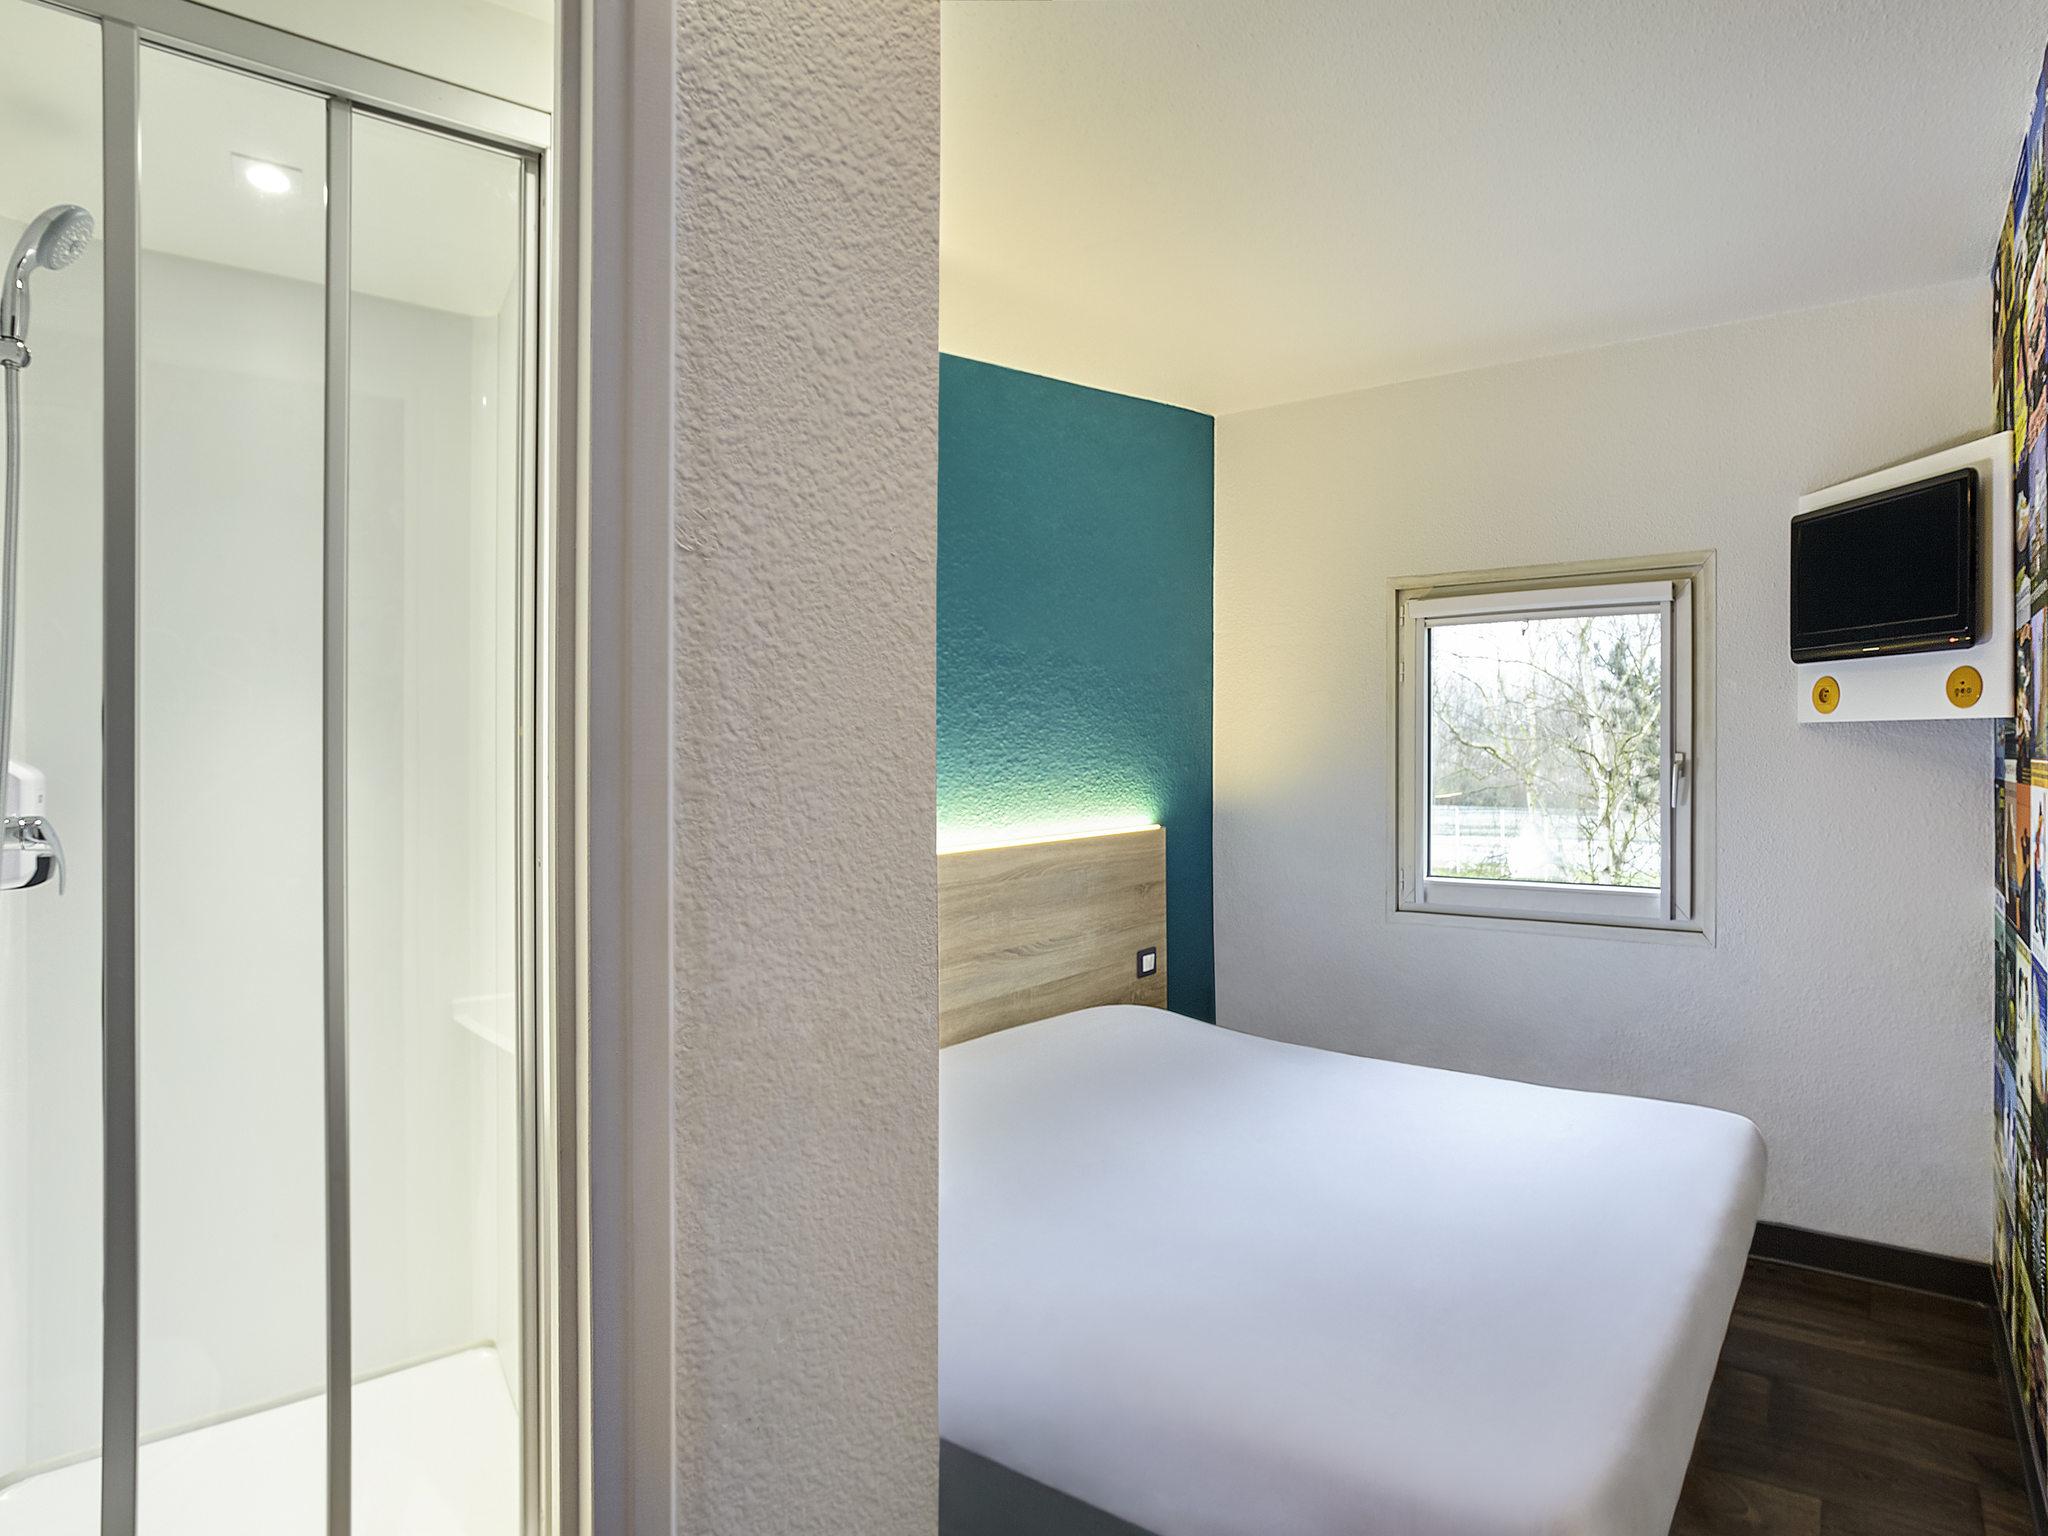 Hotell – hotelF1 Béziers Est (rénové)